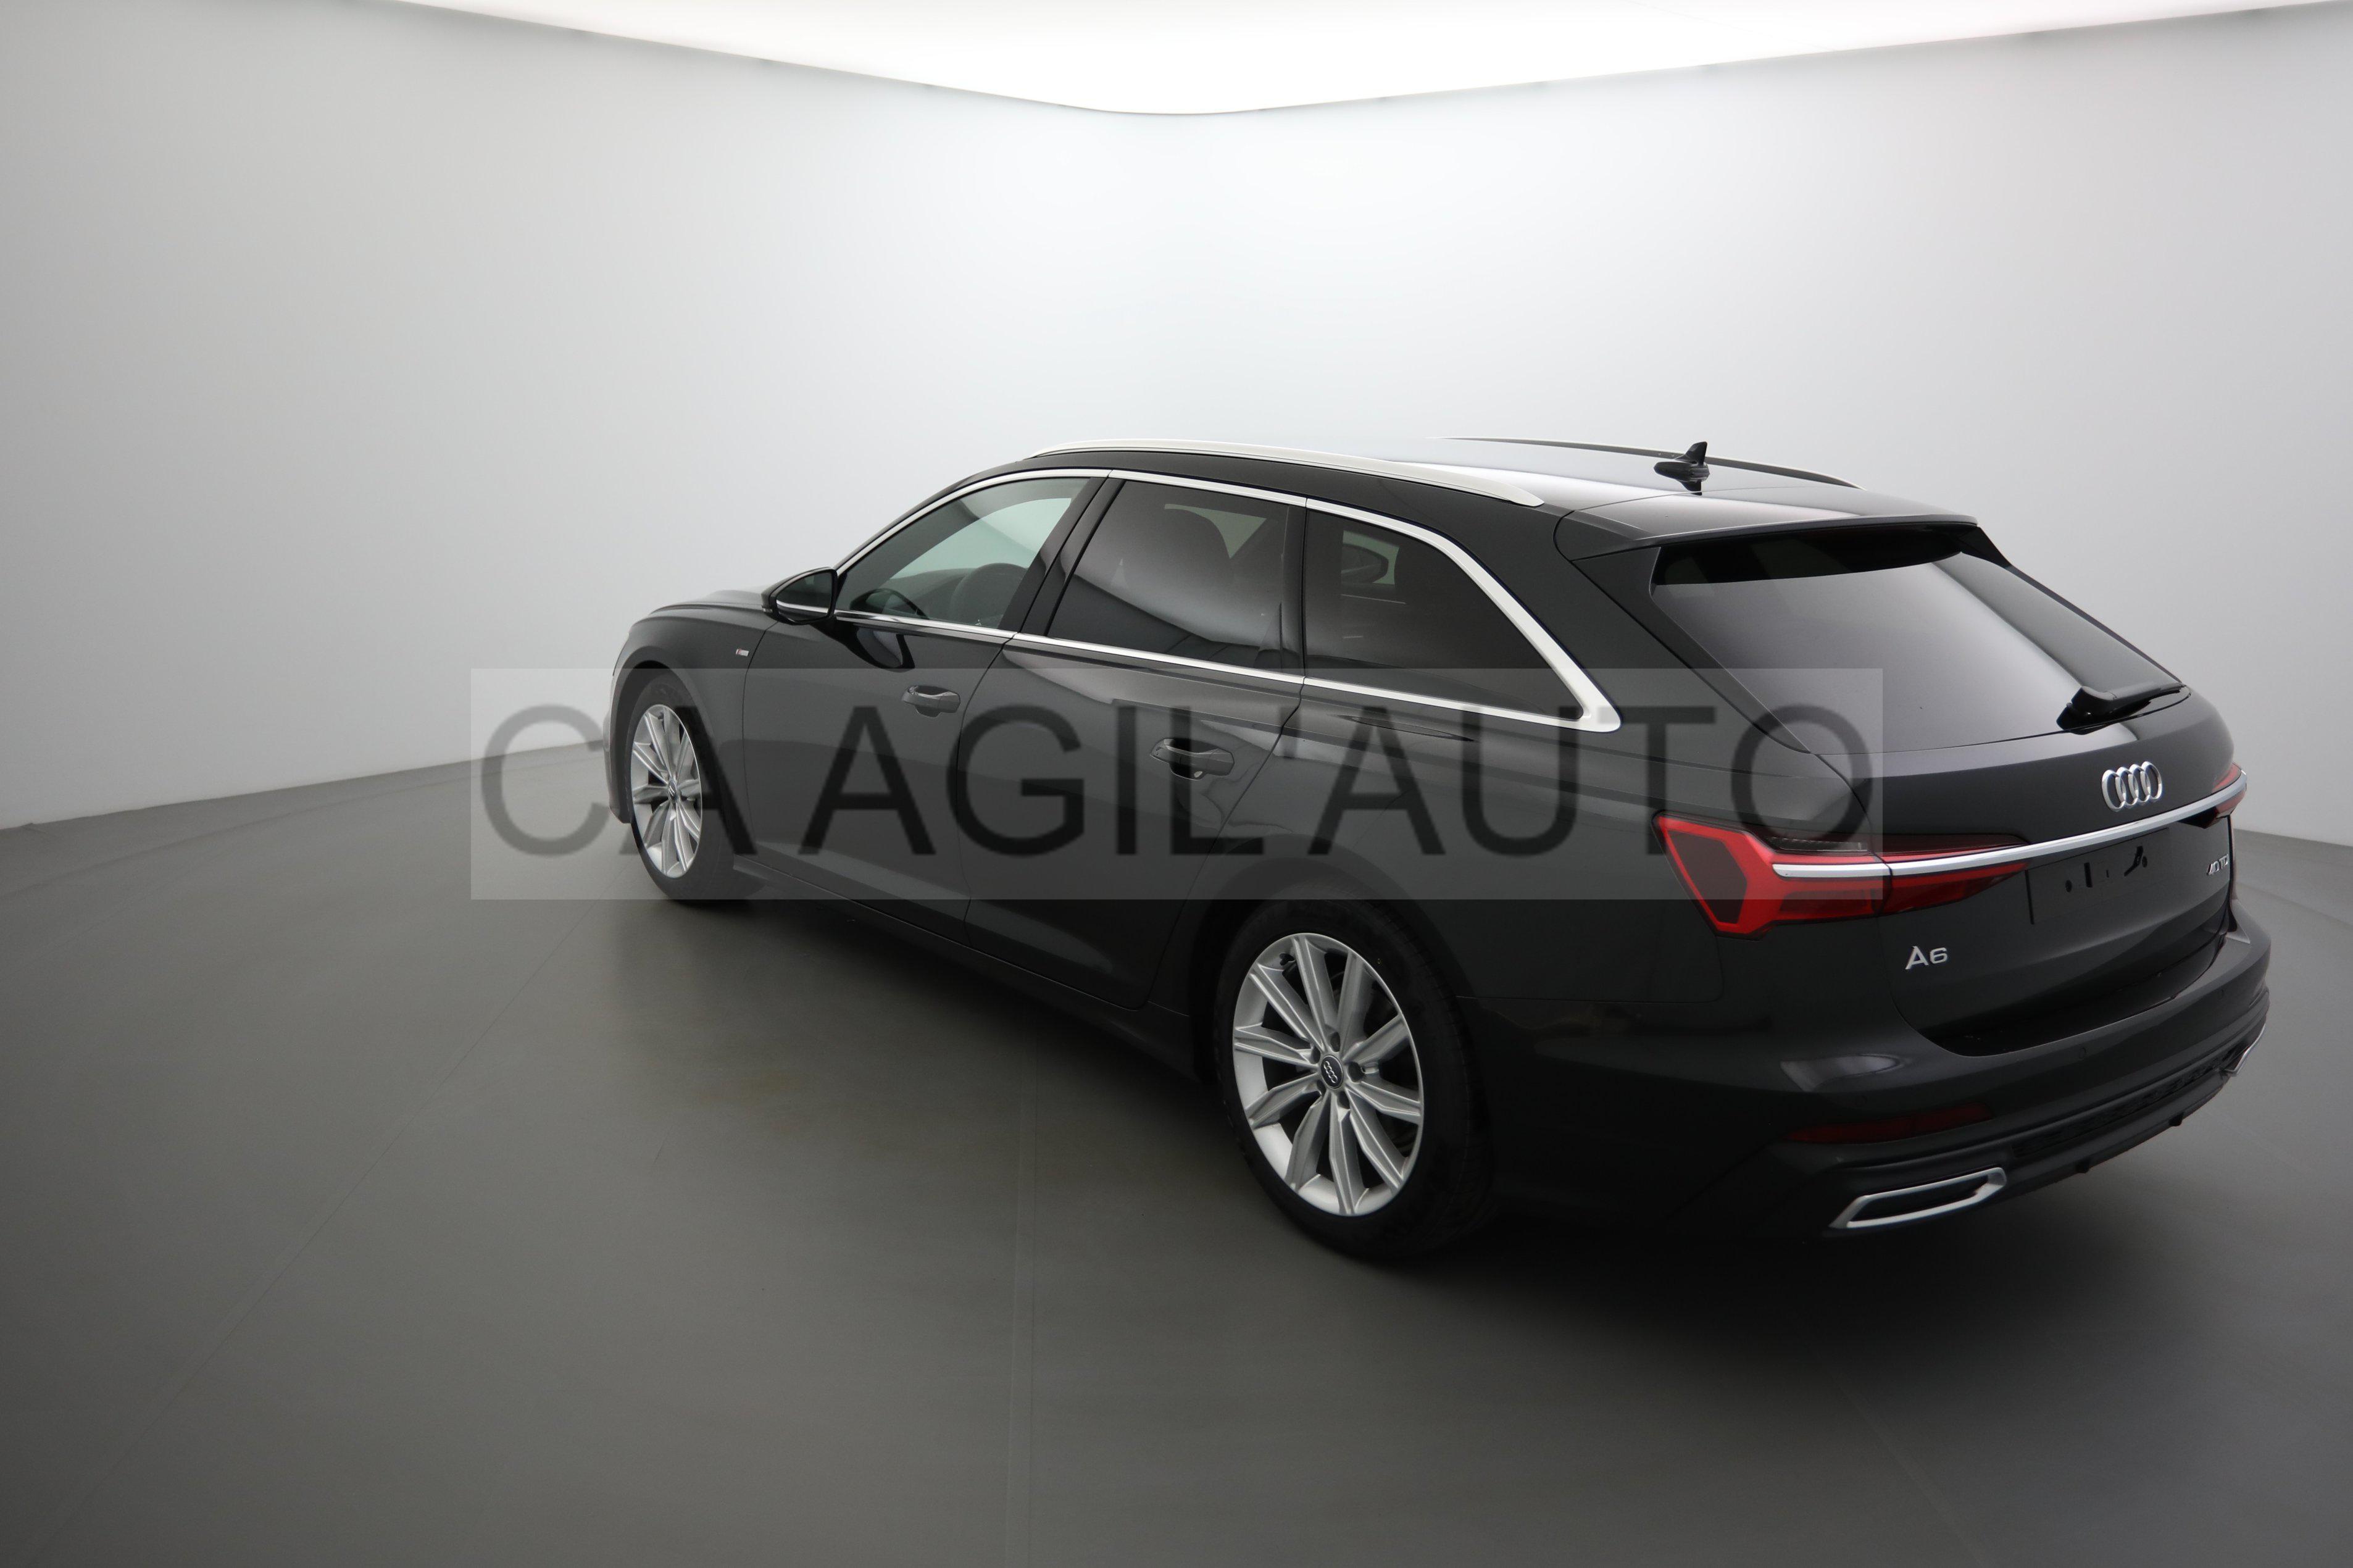 Audi A6 Avant Nouvelle Massy Cedex 11905359 Ca Agil Auto